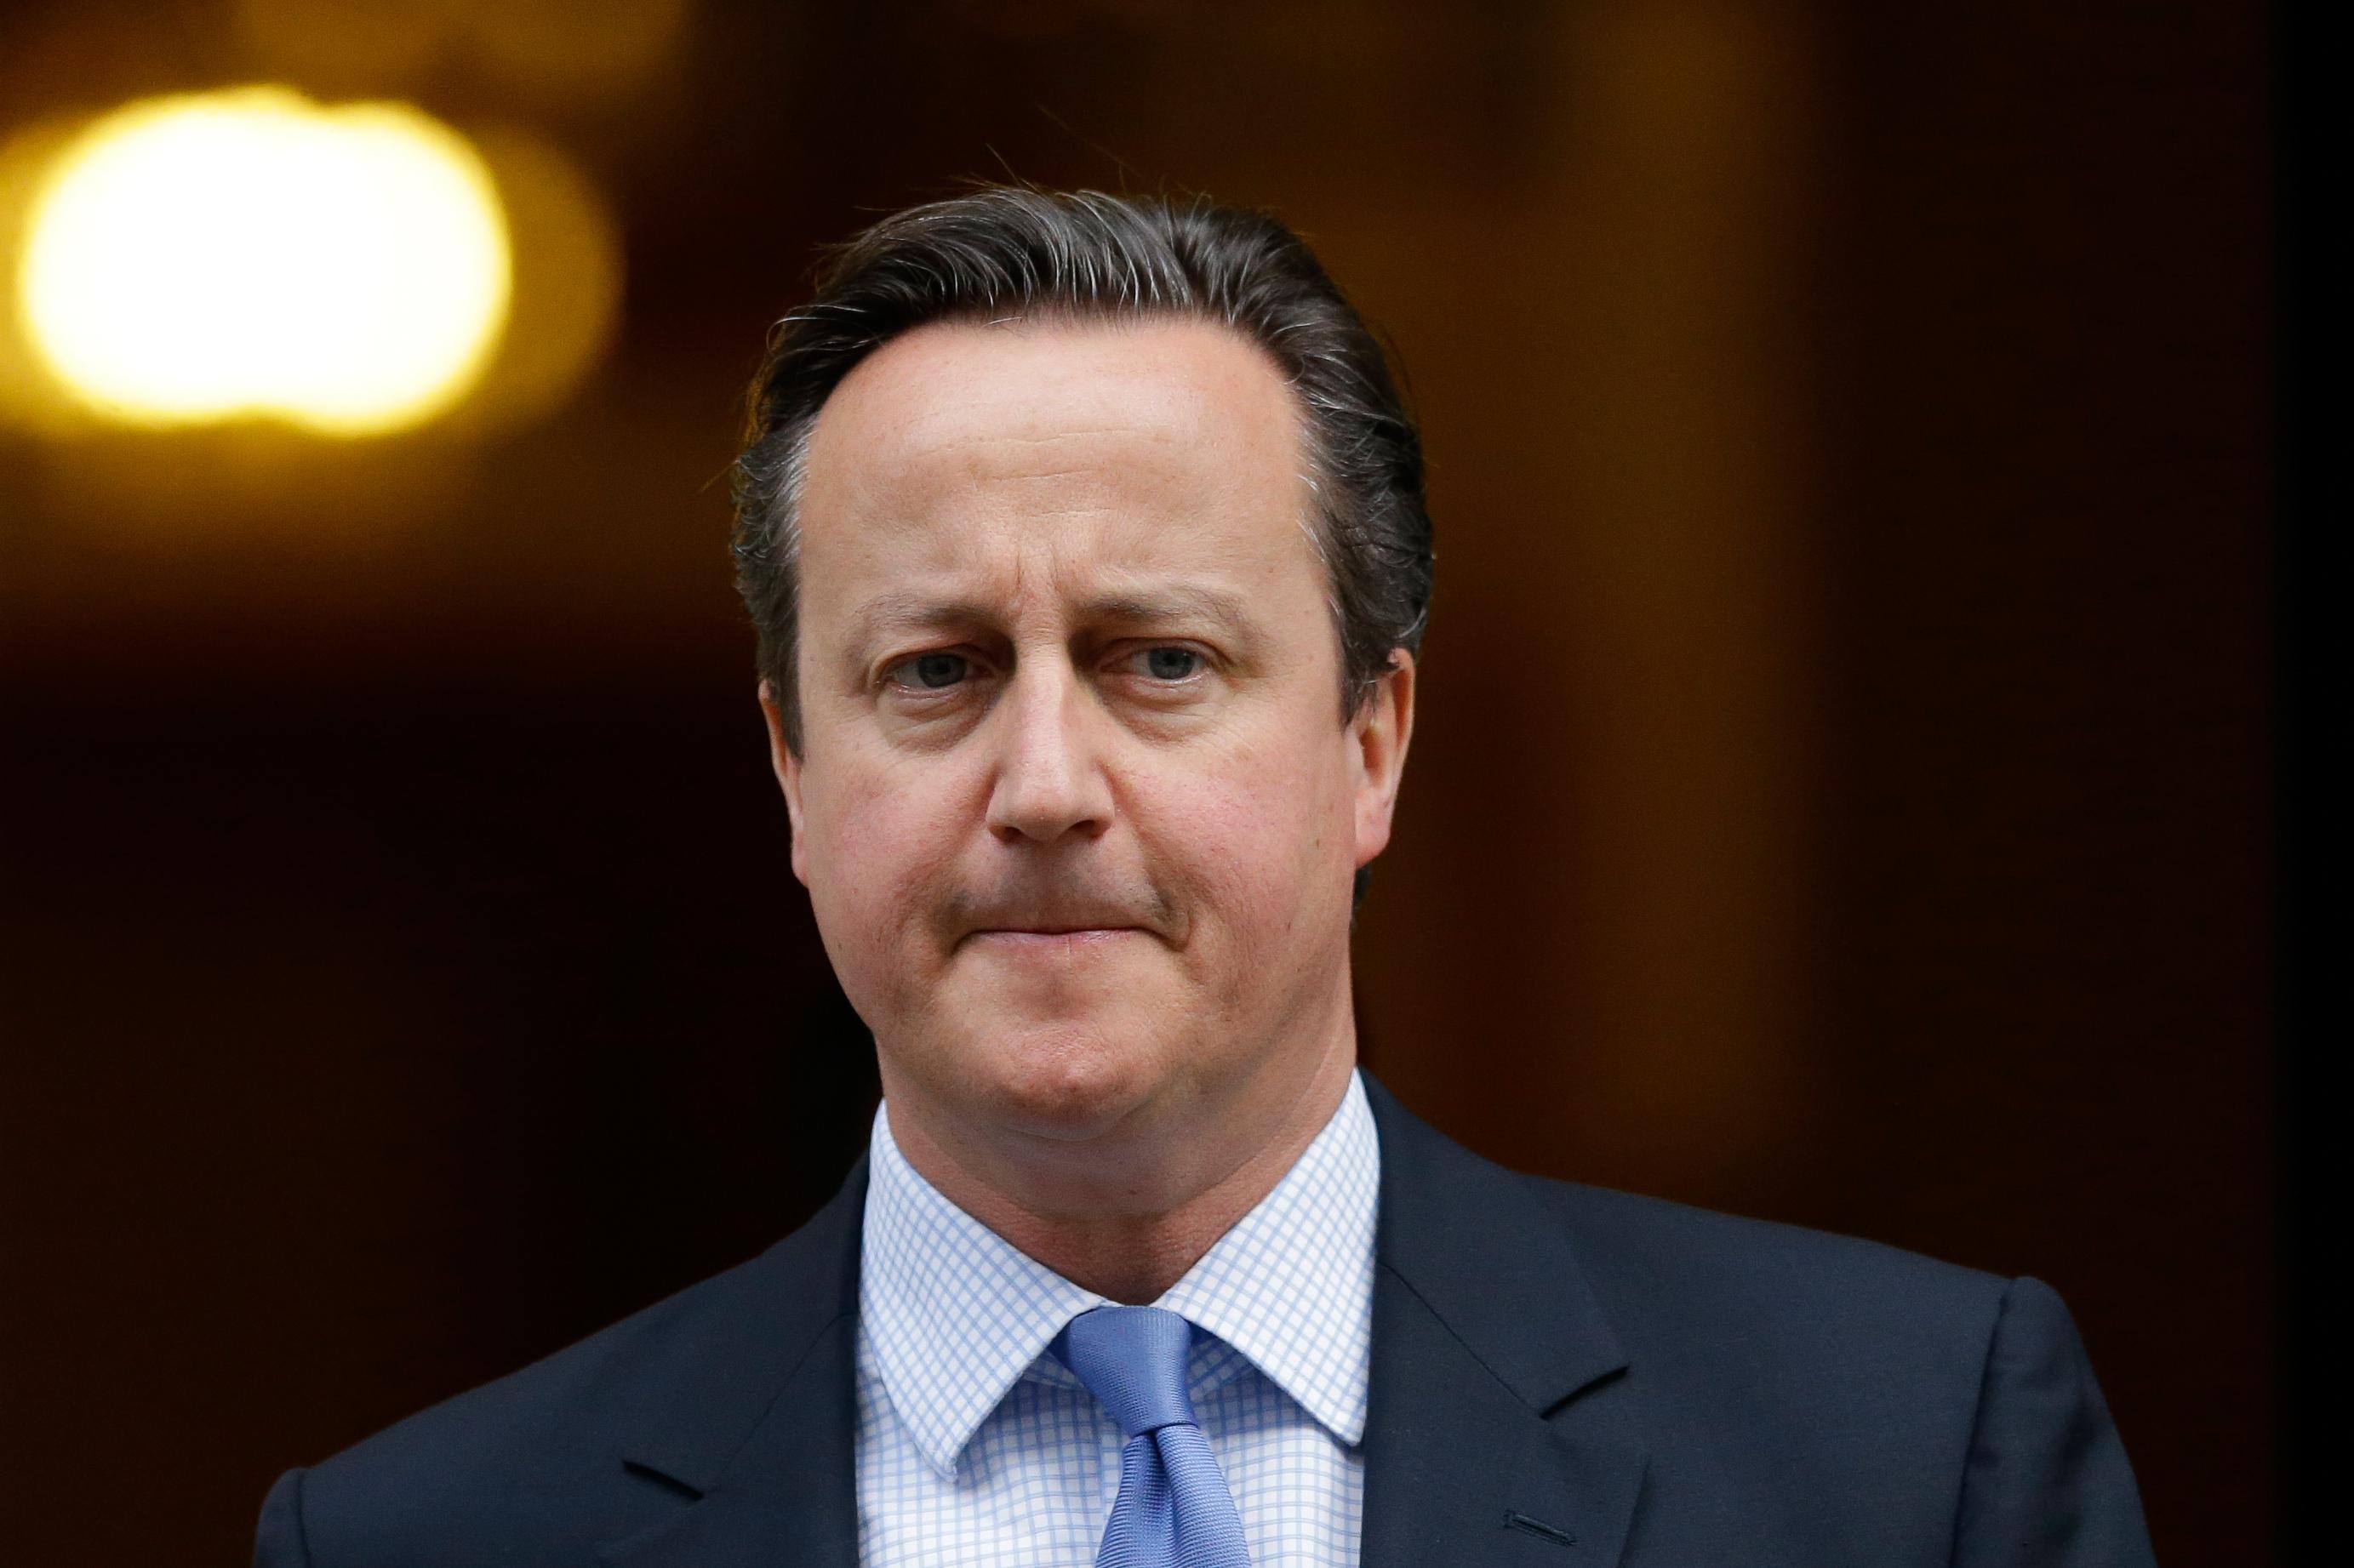 David Cameron Full Hd